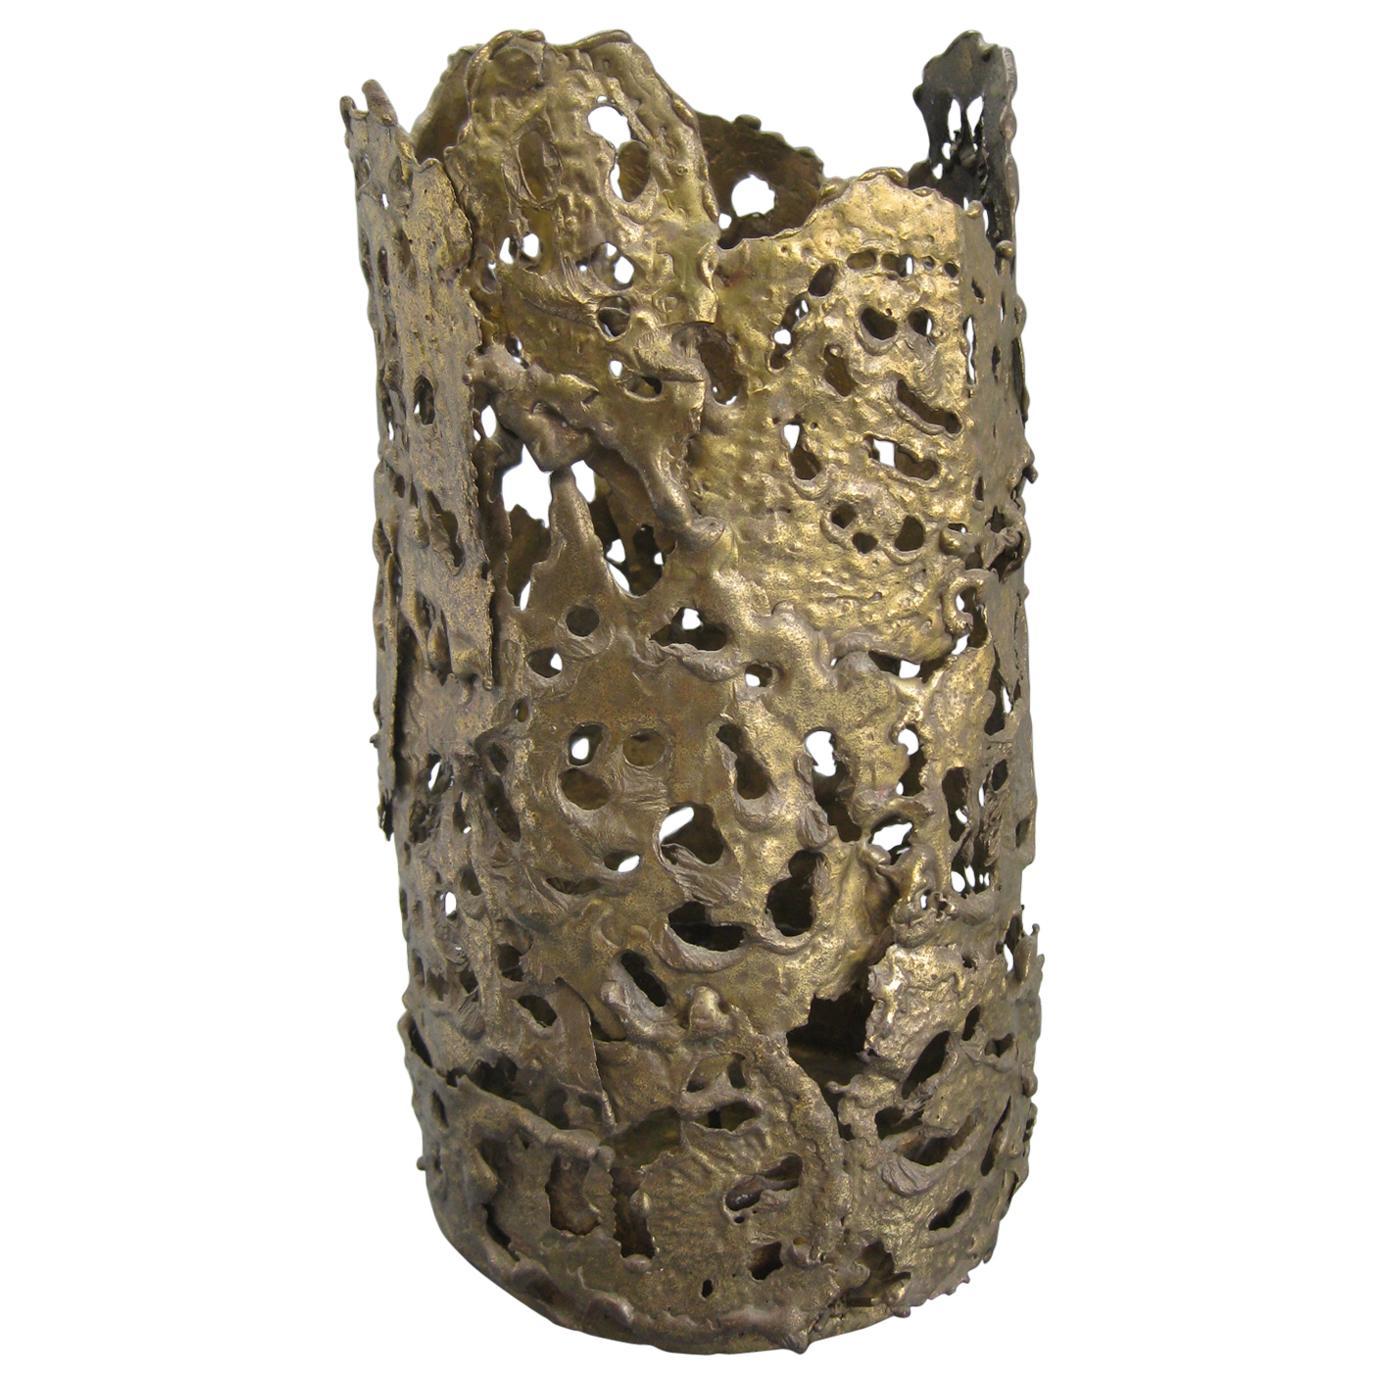 1971 Brutalist Torch-Cut Brass Candleholder Vase Sculpture Artist Signed